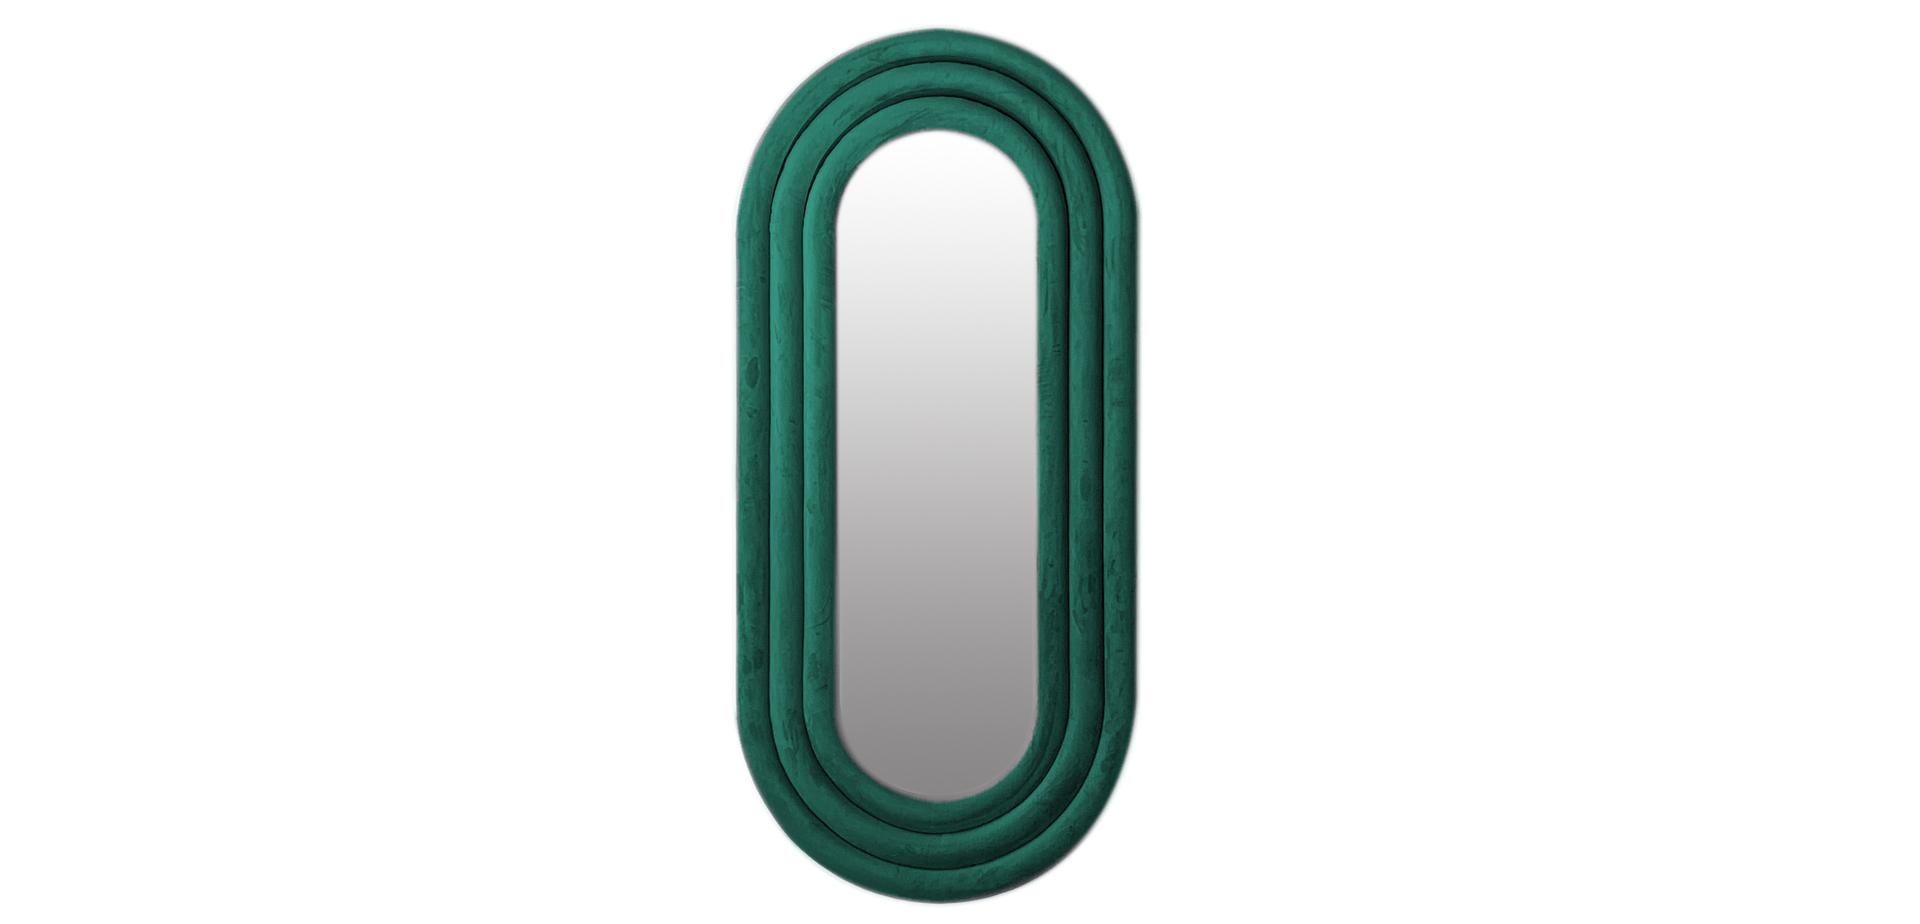 oglinda-ronda-06.jpg